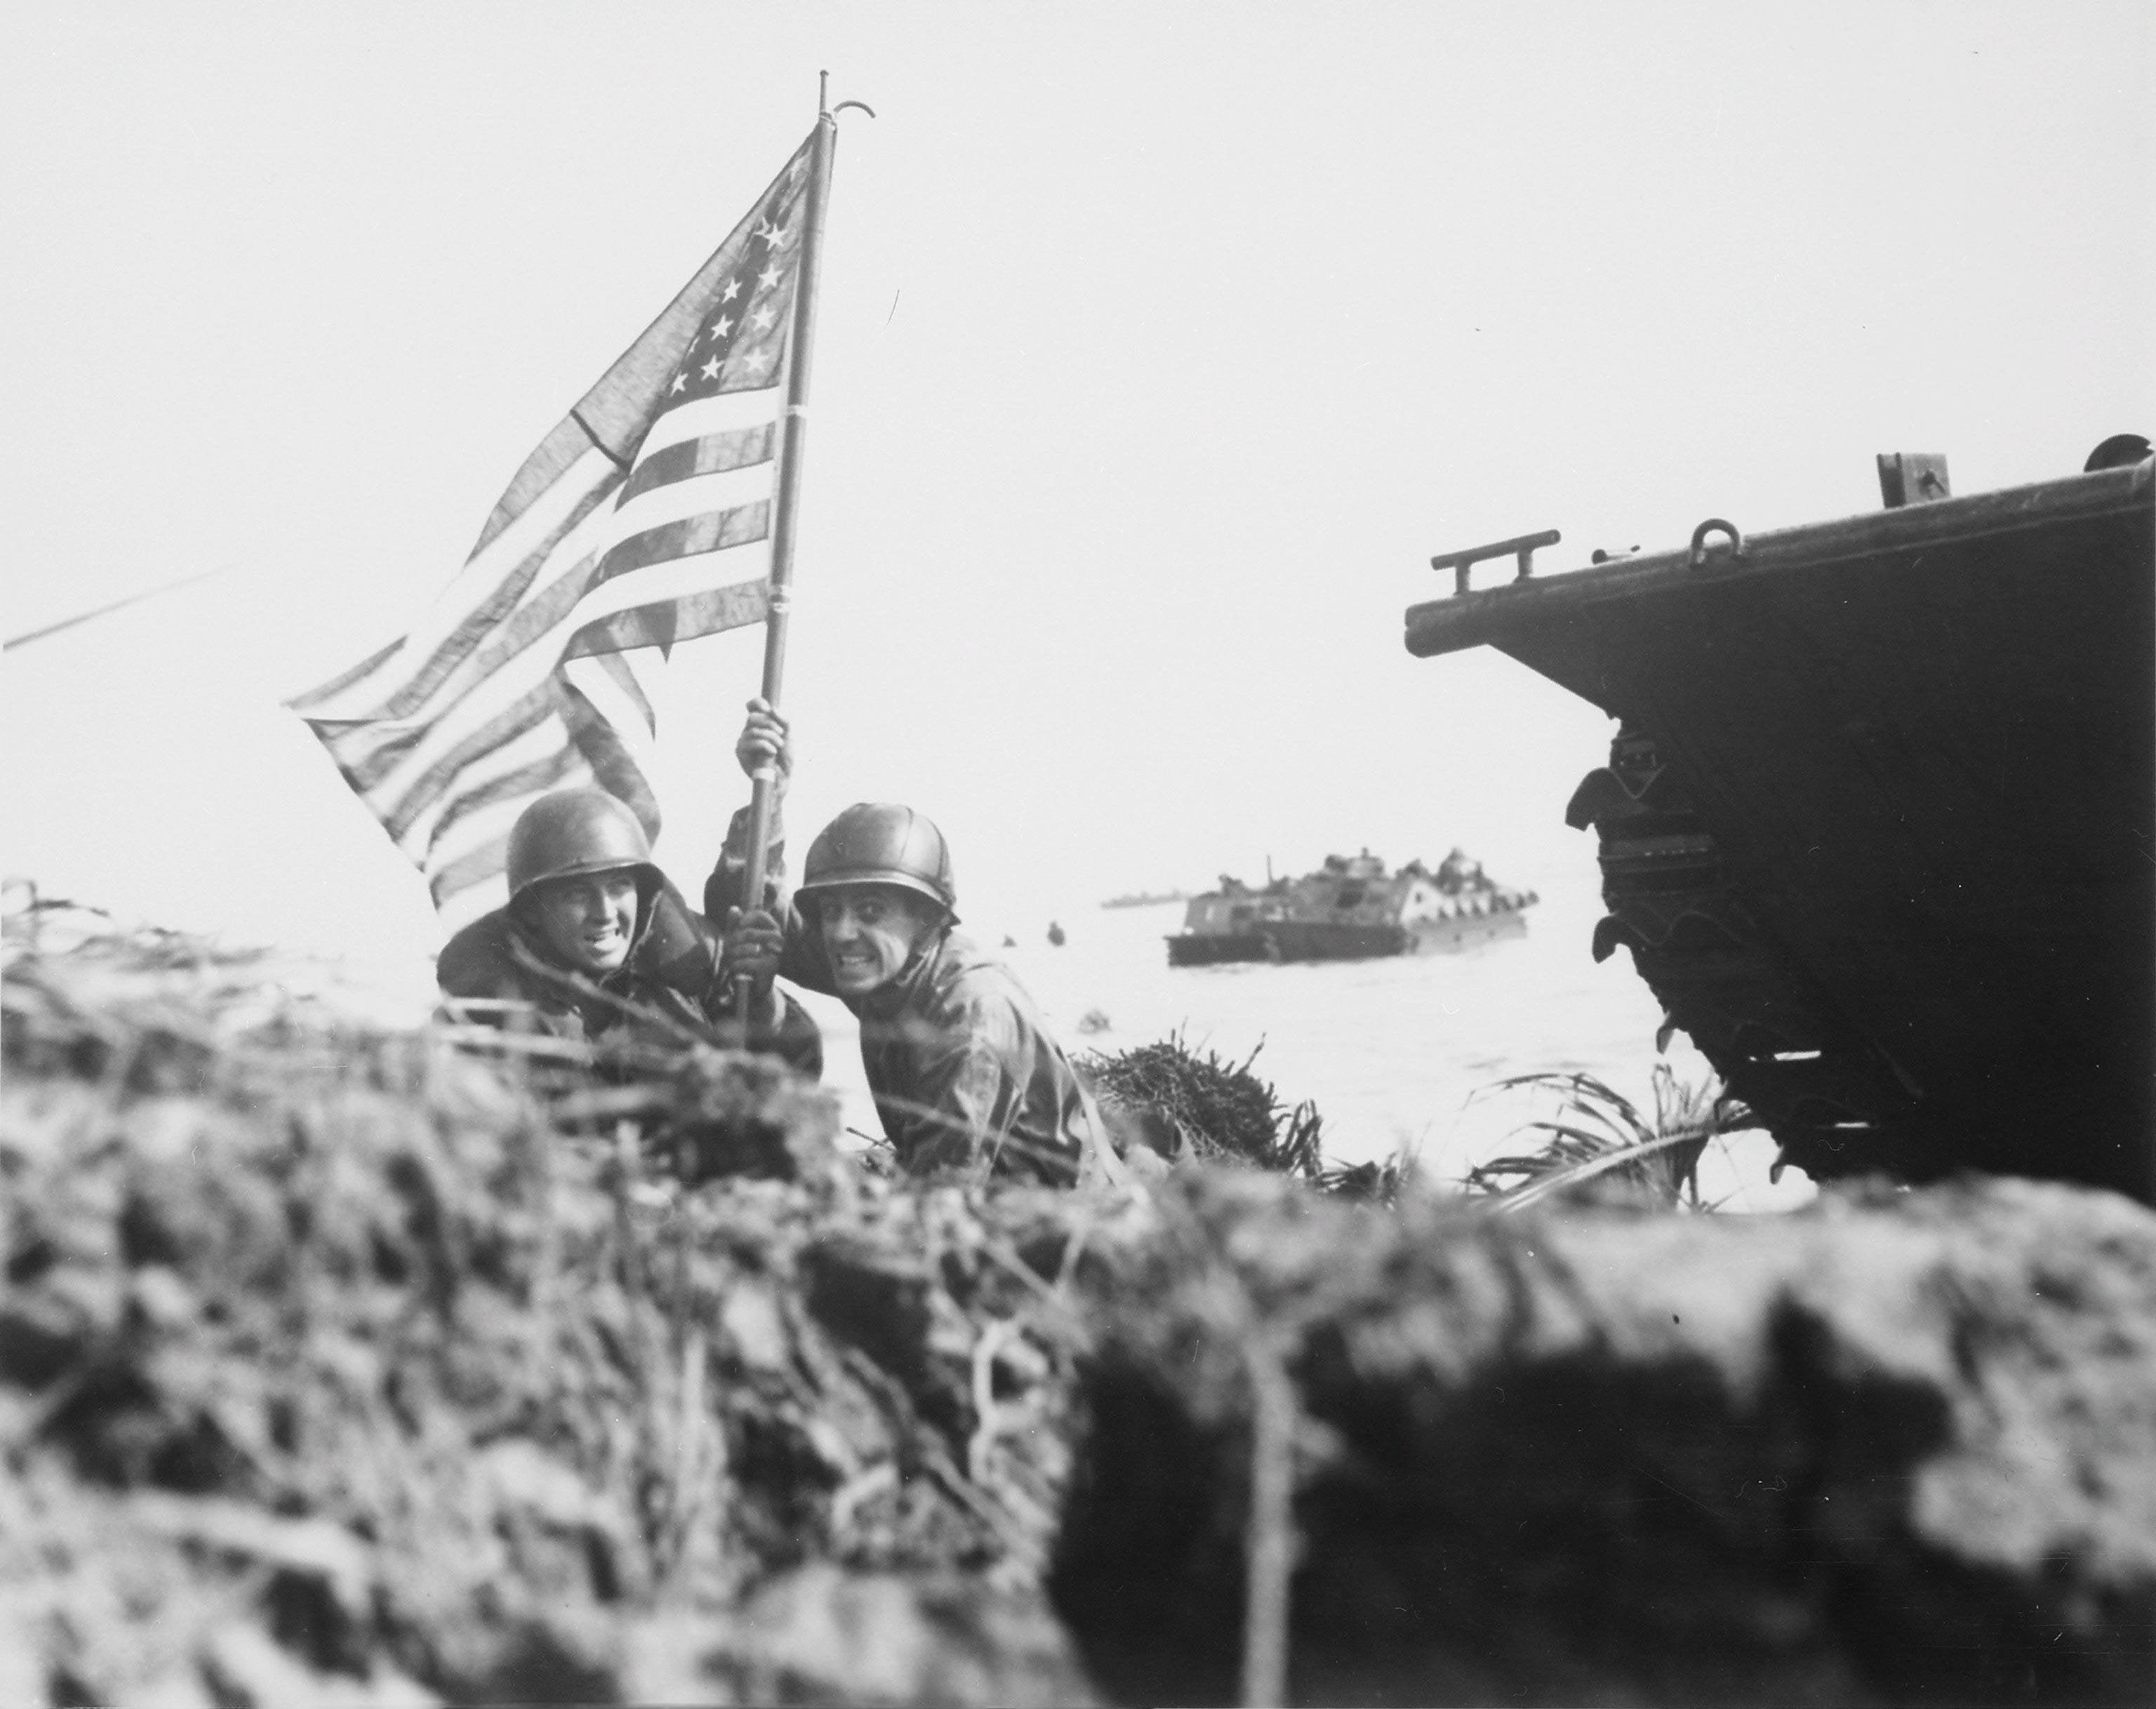 File:First flag on Guam - 1944.jpg